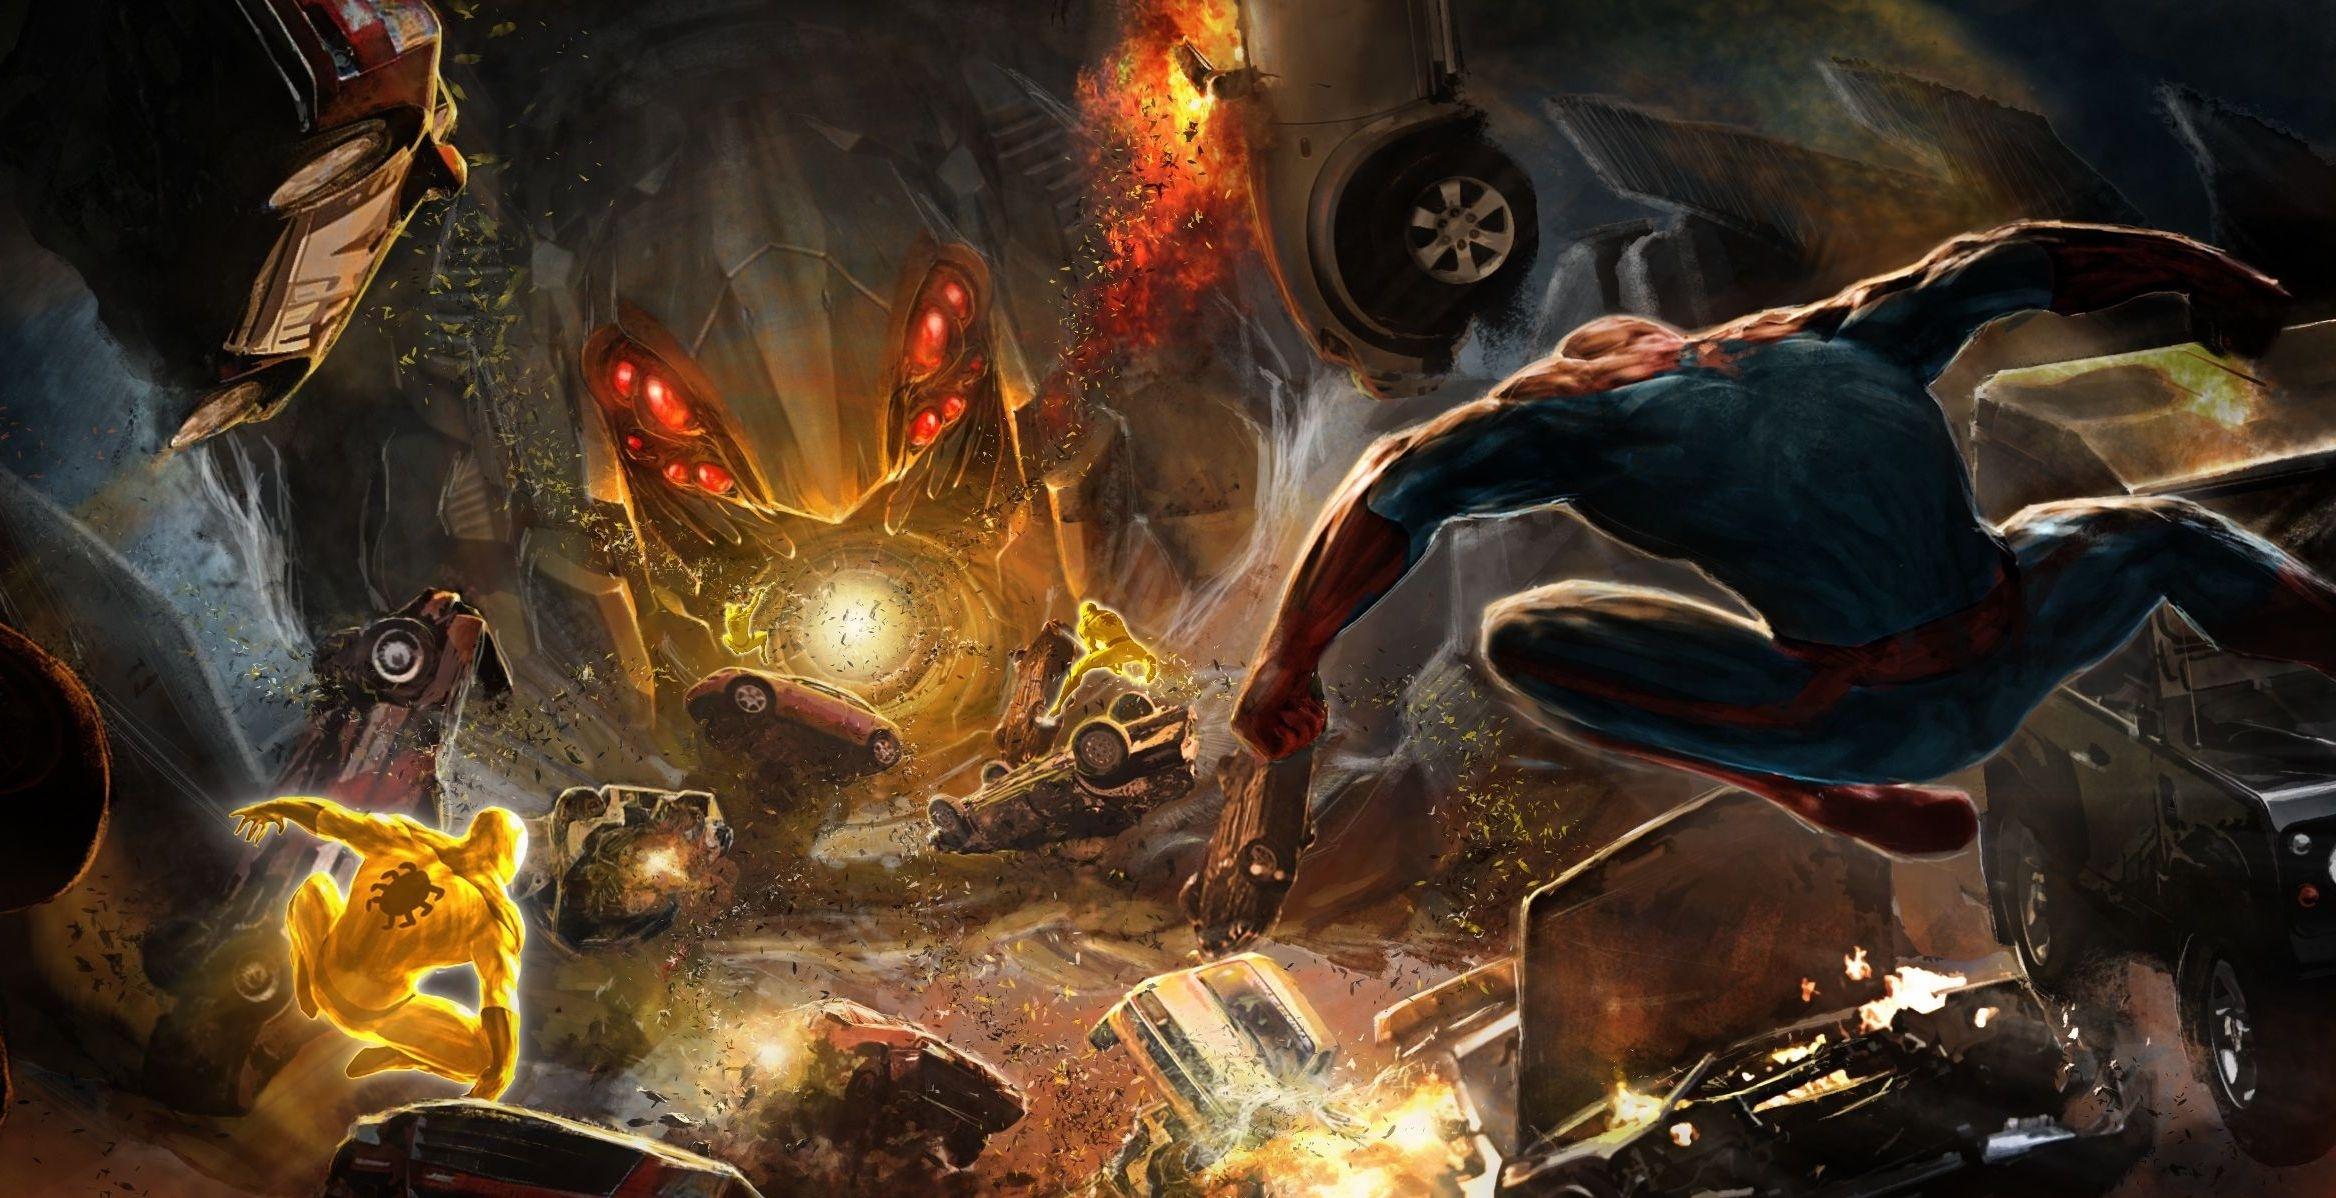 spiderman games wallpaper